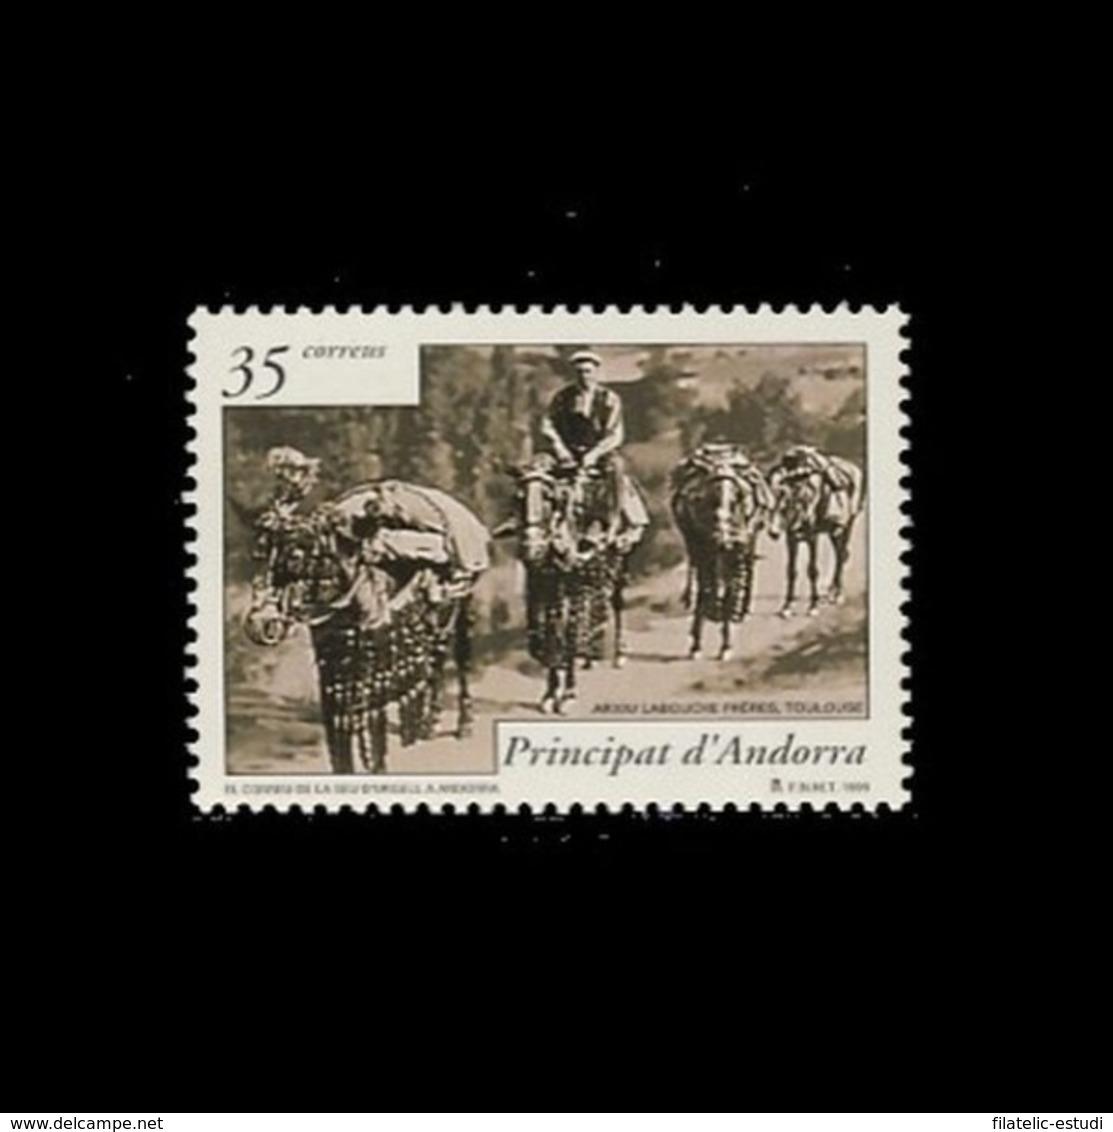 Andorra Española 270 1999 Historia Postal MNH - Spagna